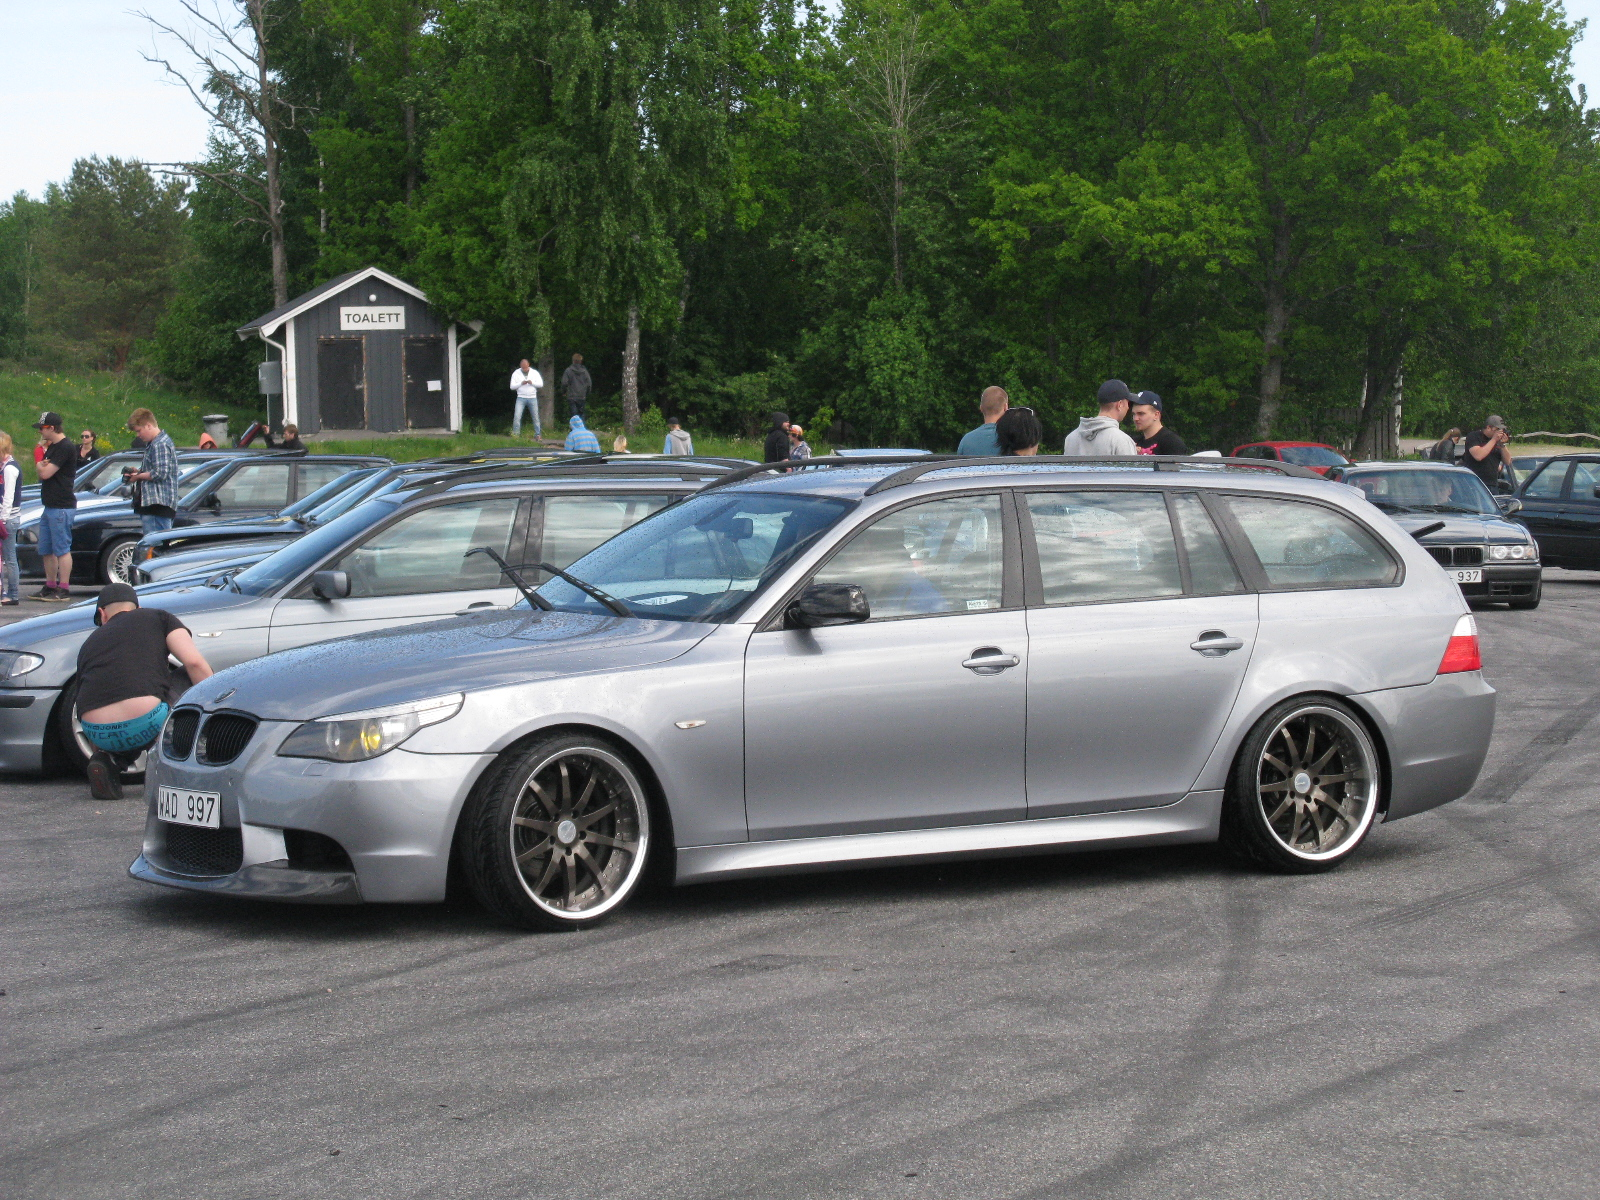 File Bmw 5 Series Touring M Sport E61 8869662386 Jpg Wikimedia Commons